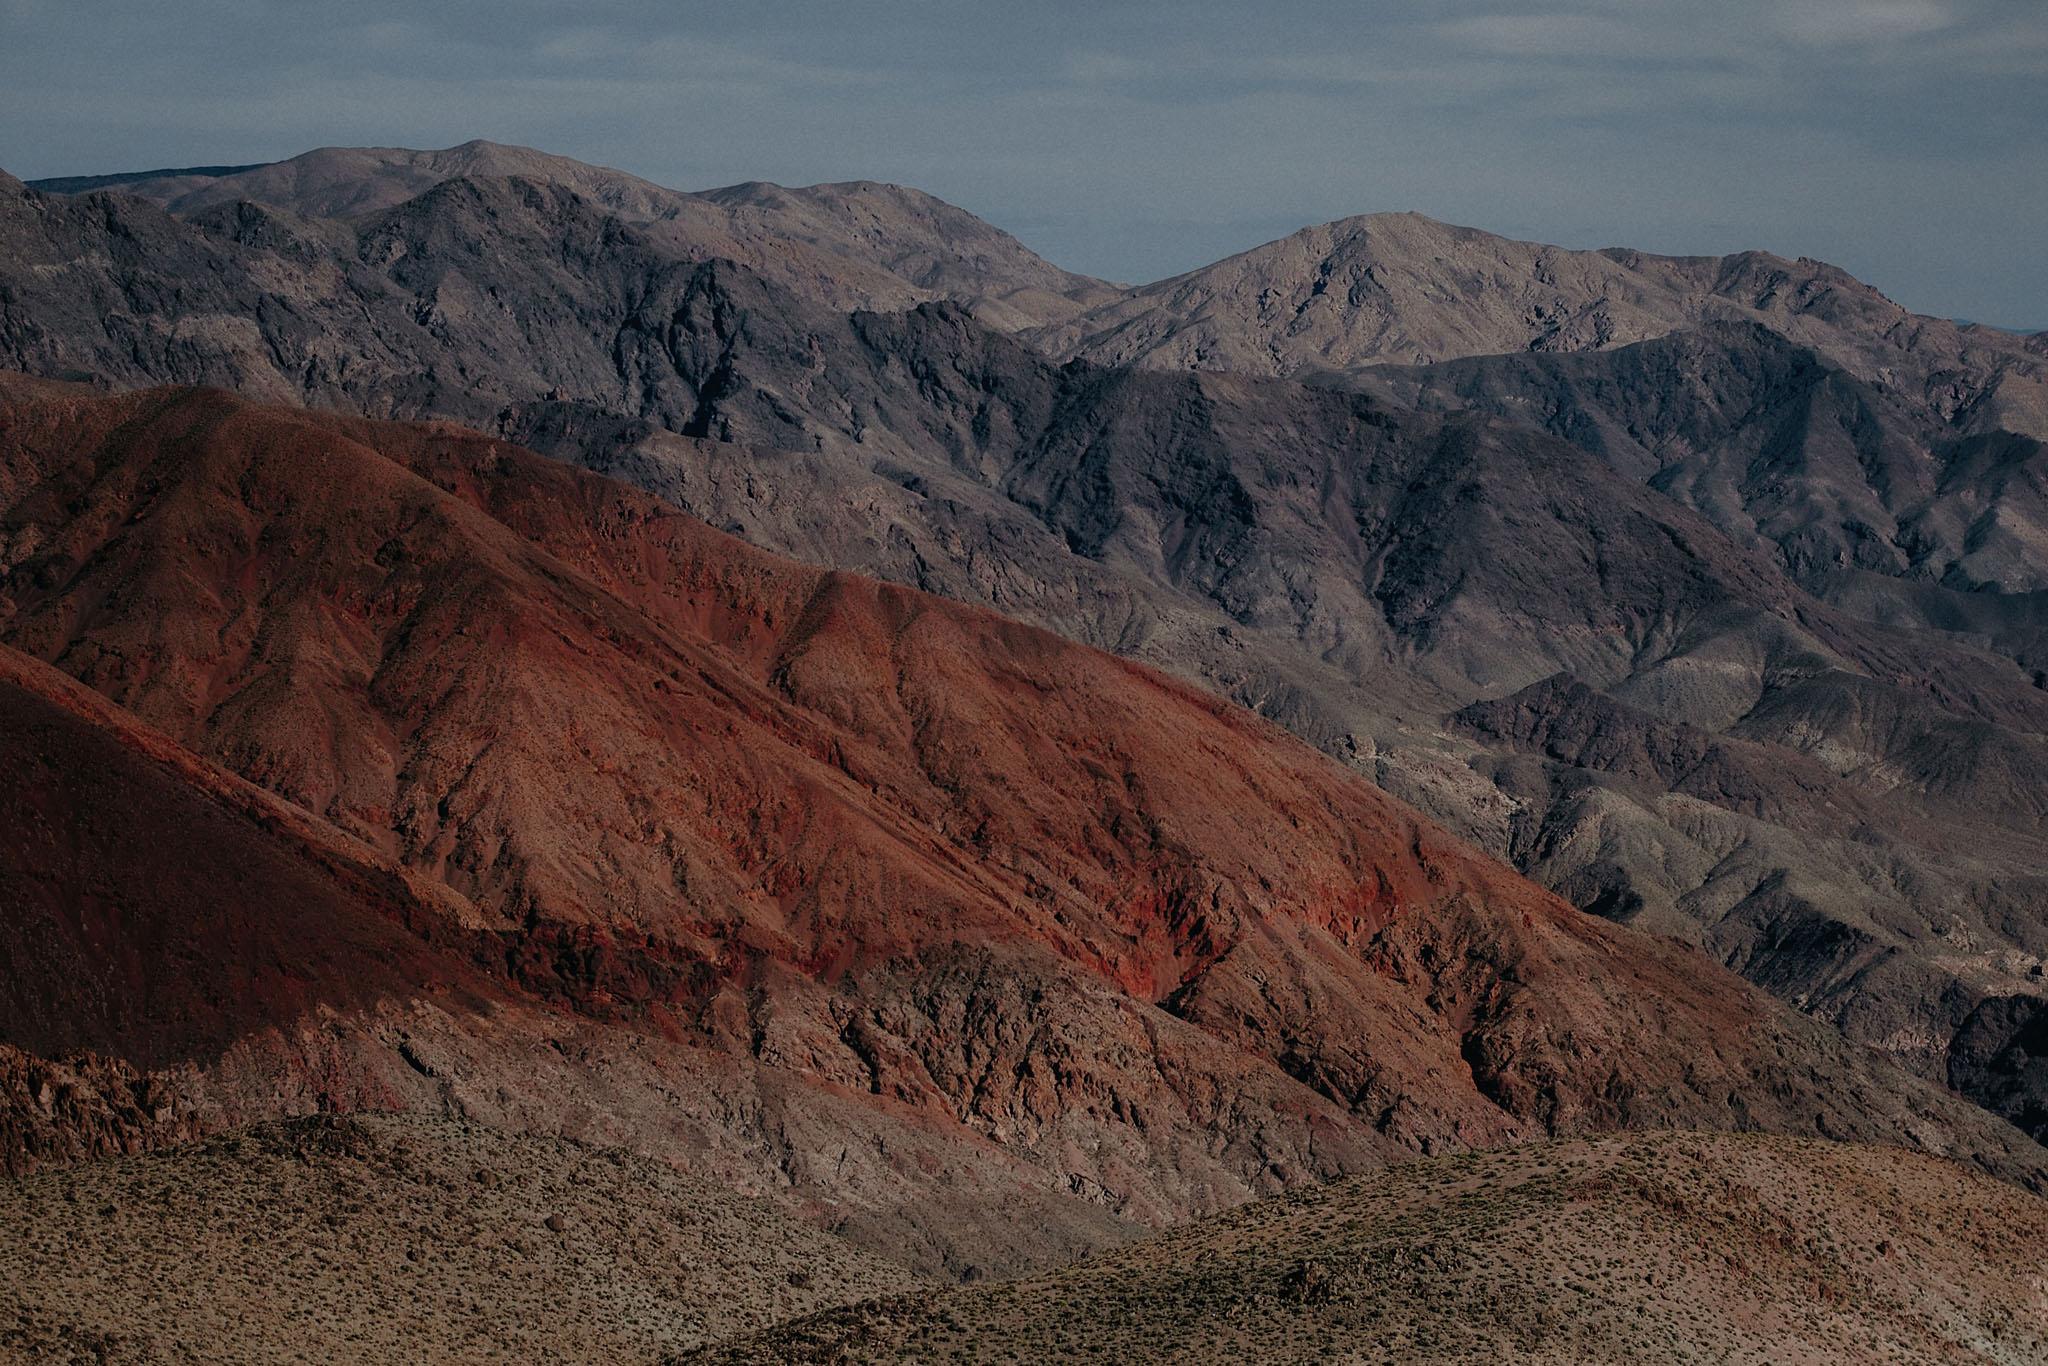 death valley adventure elopement wedding photographer national park desert mountains